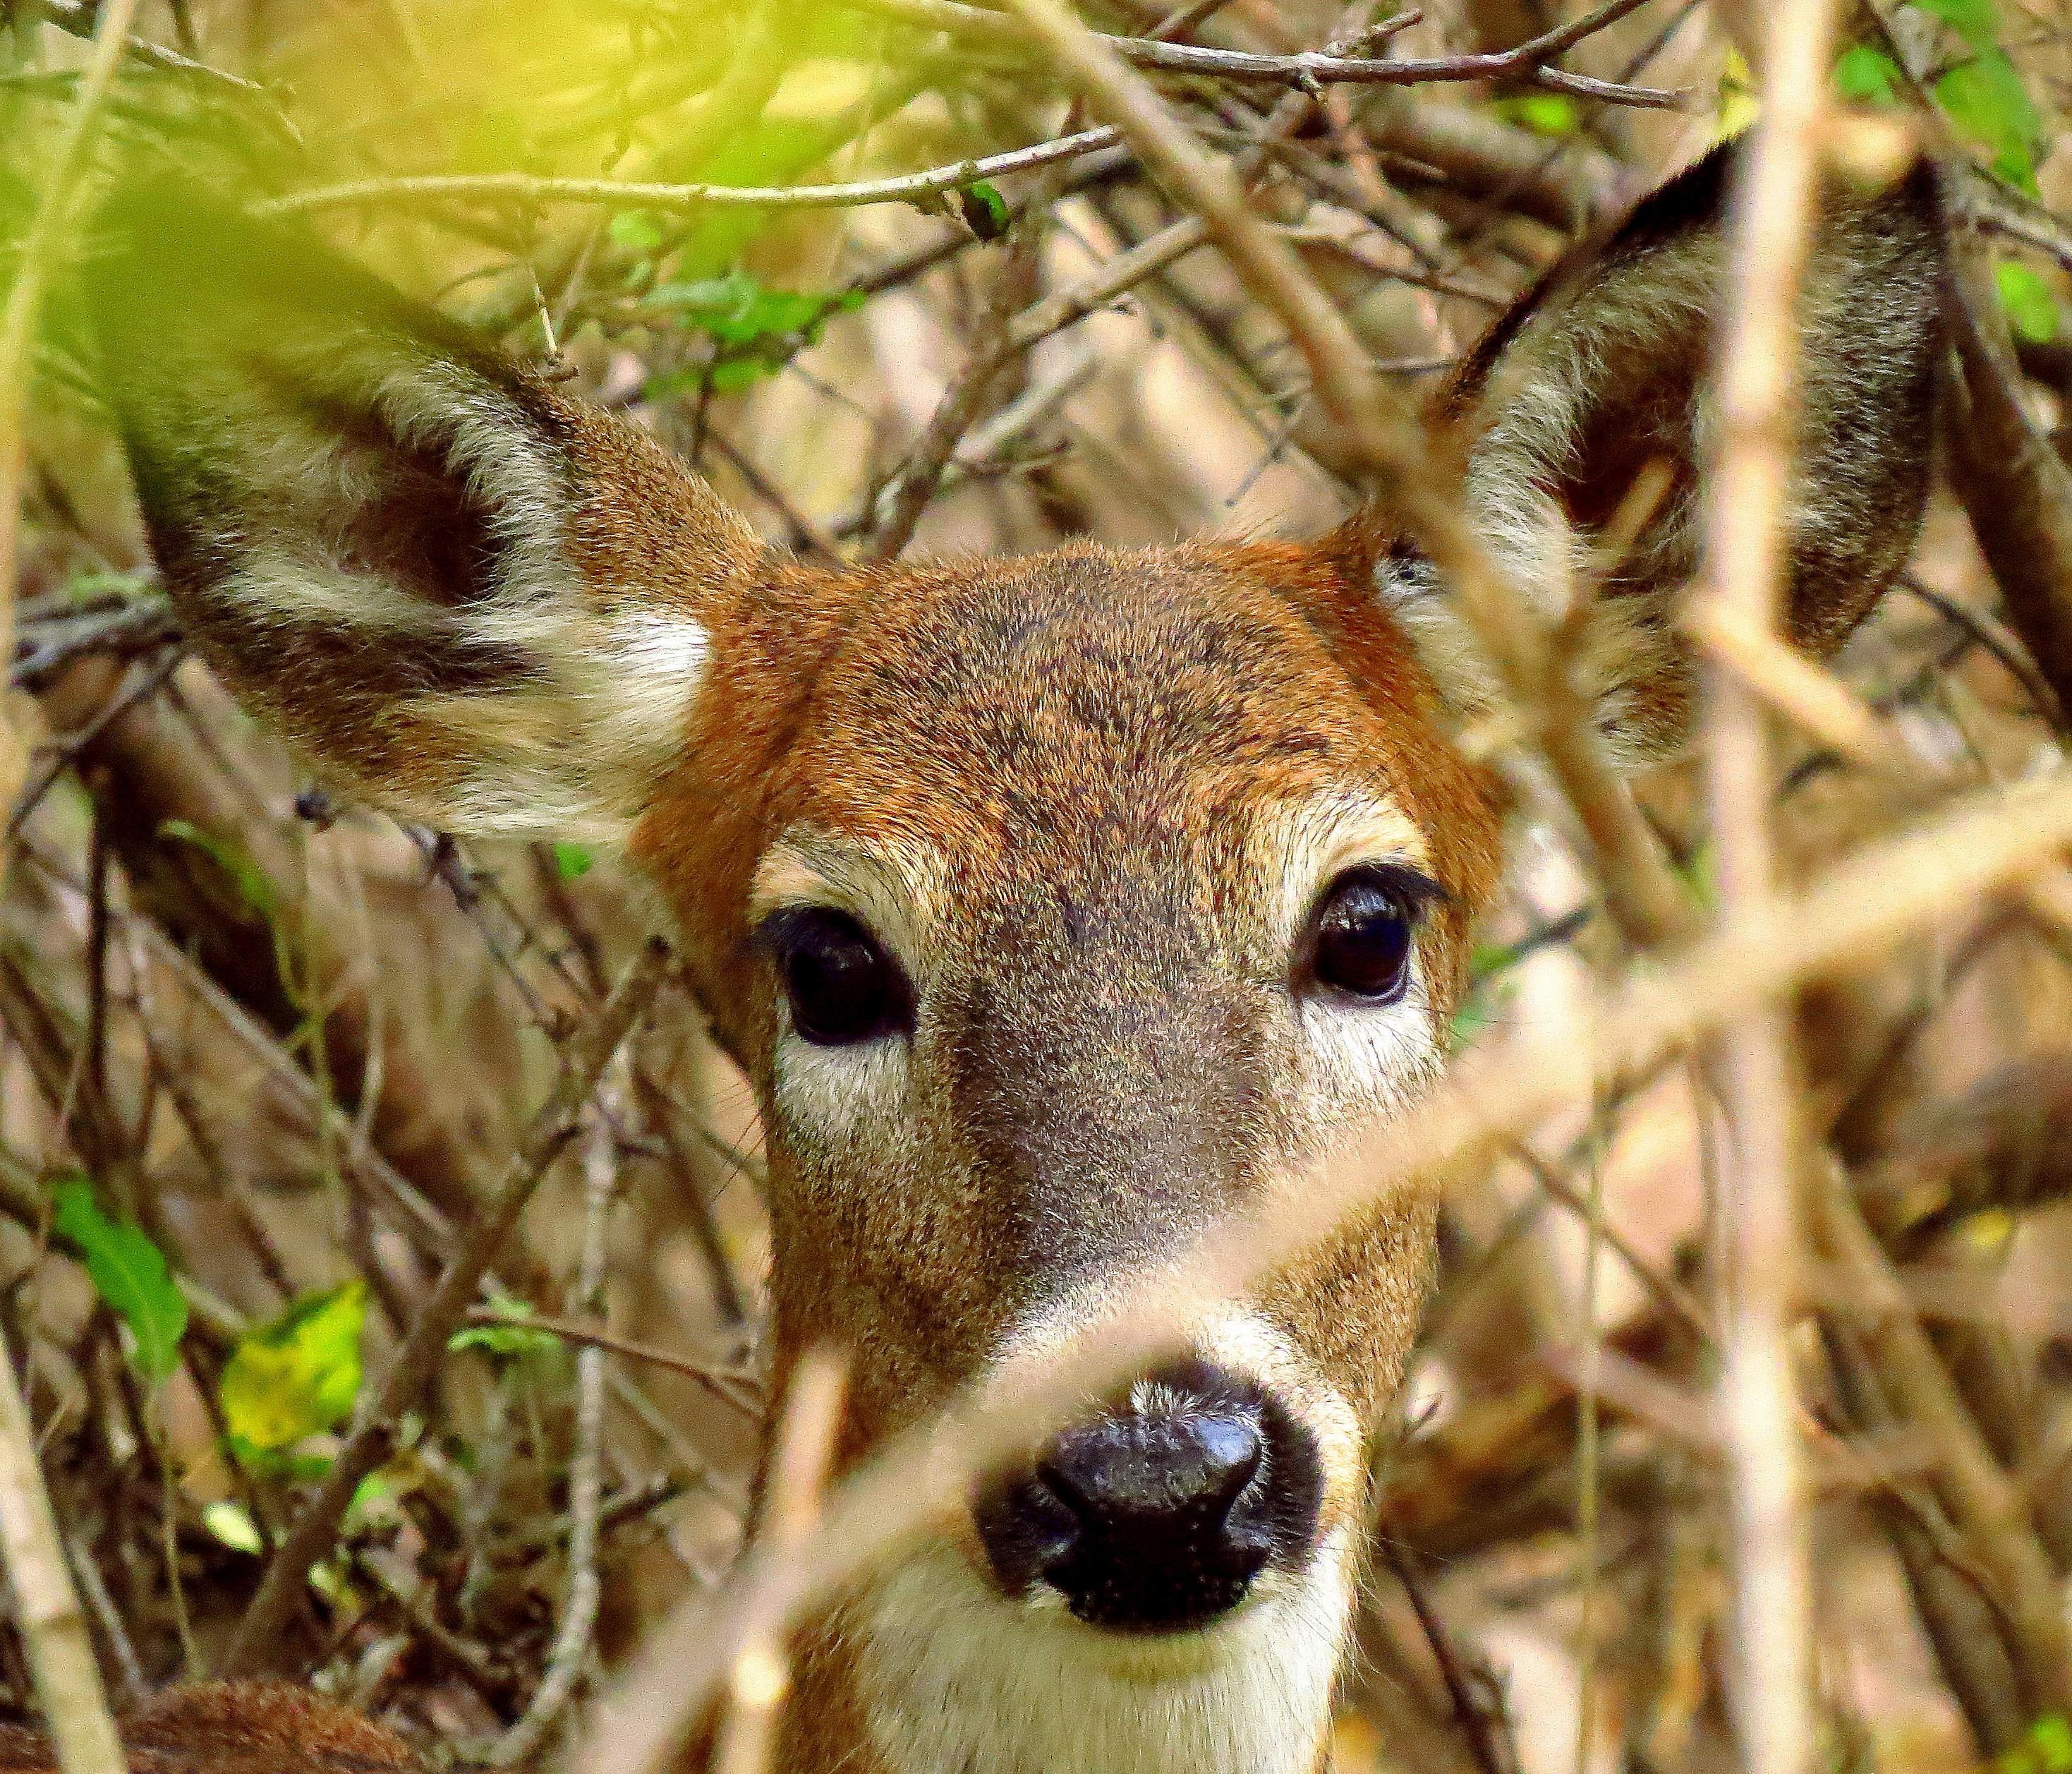 Deer Management: New York shares a plan for Urban and Suburban Communities